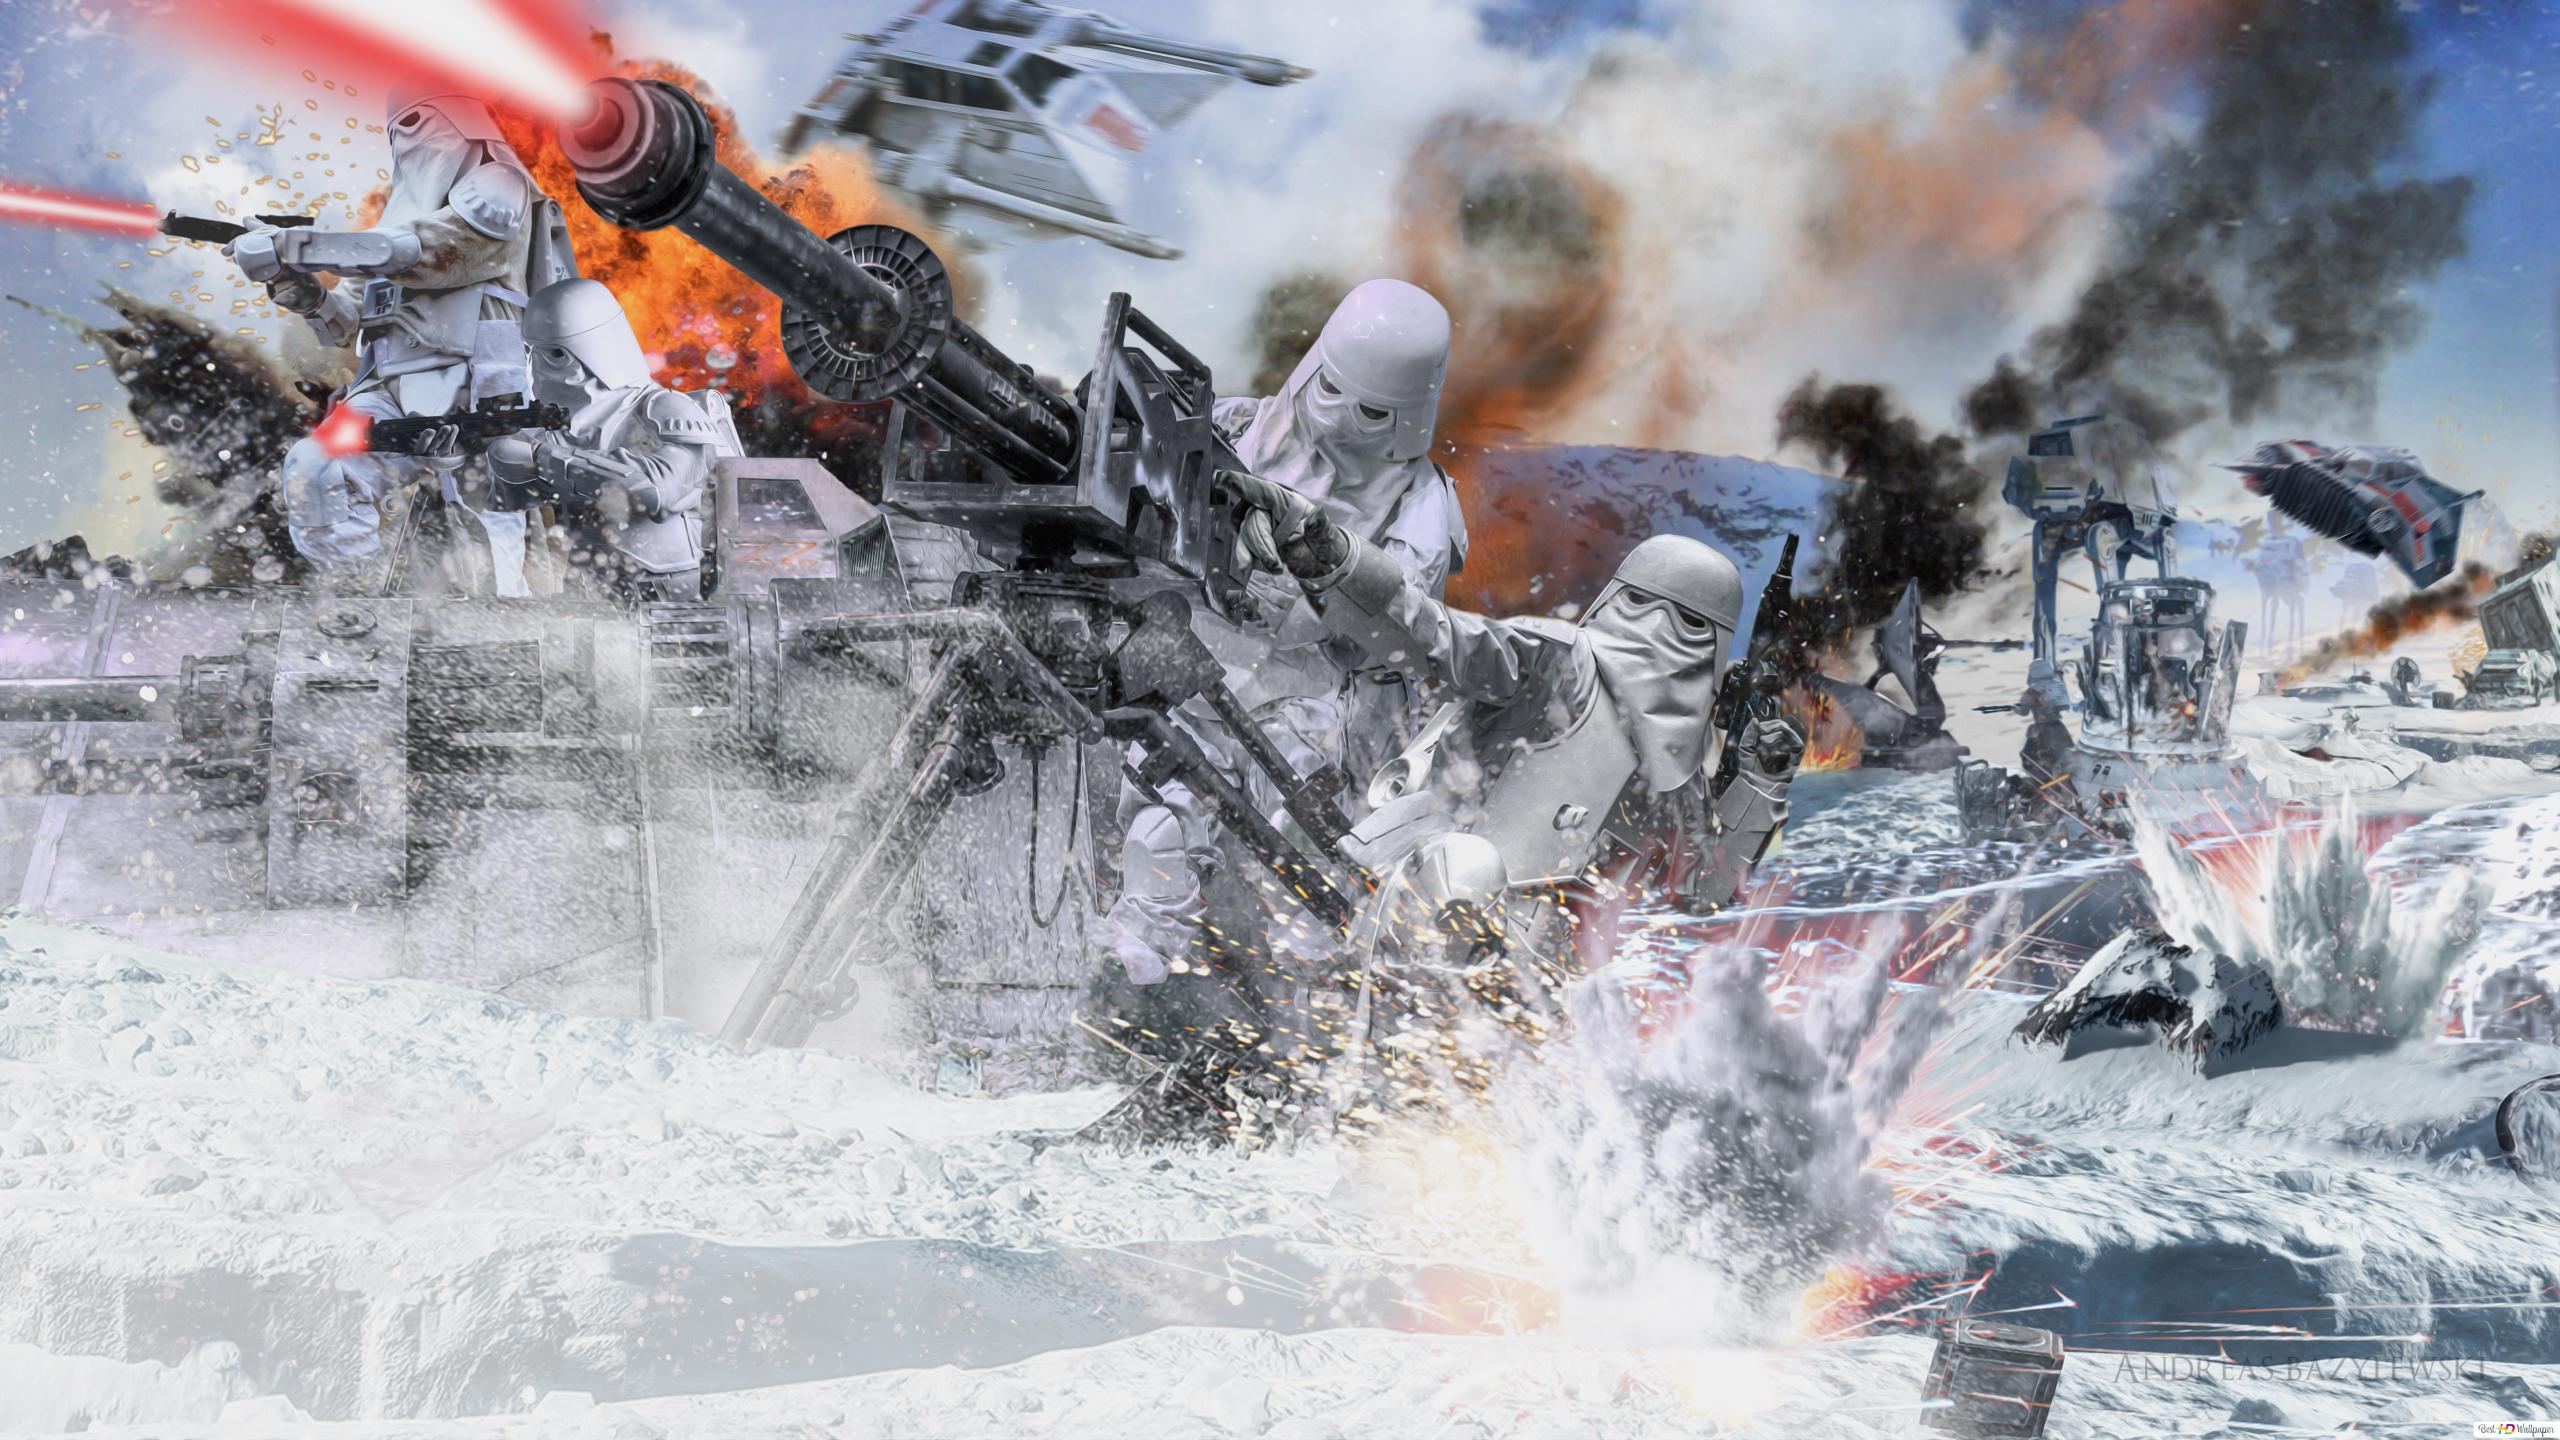 Star Wars Episode V The Empire Strikes Back Hd Wallpaper Download